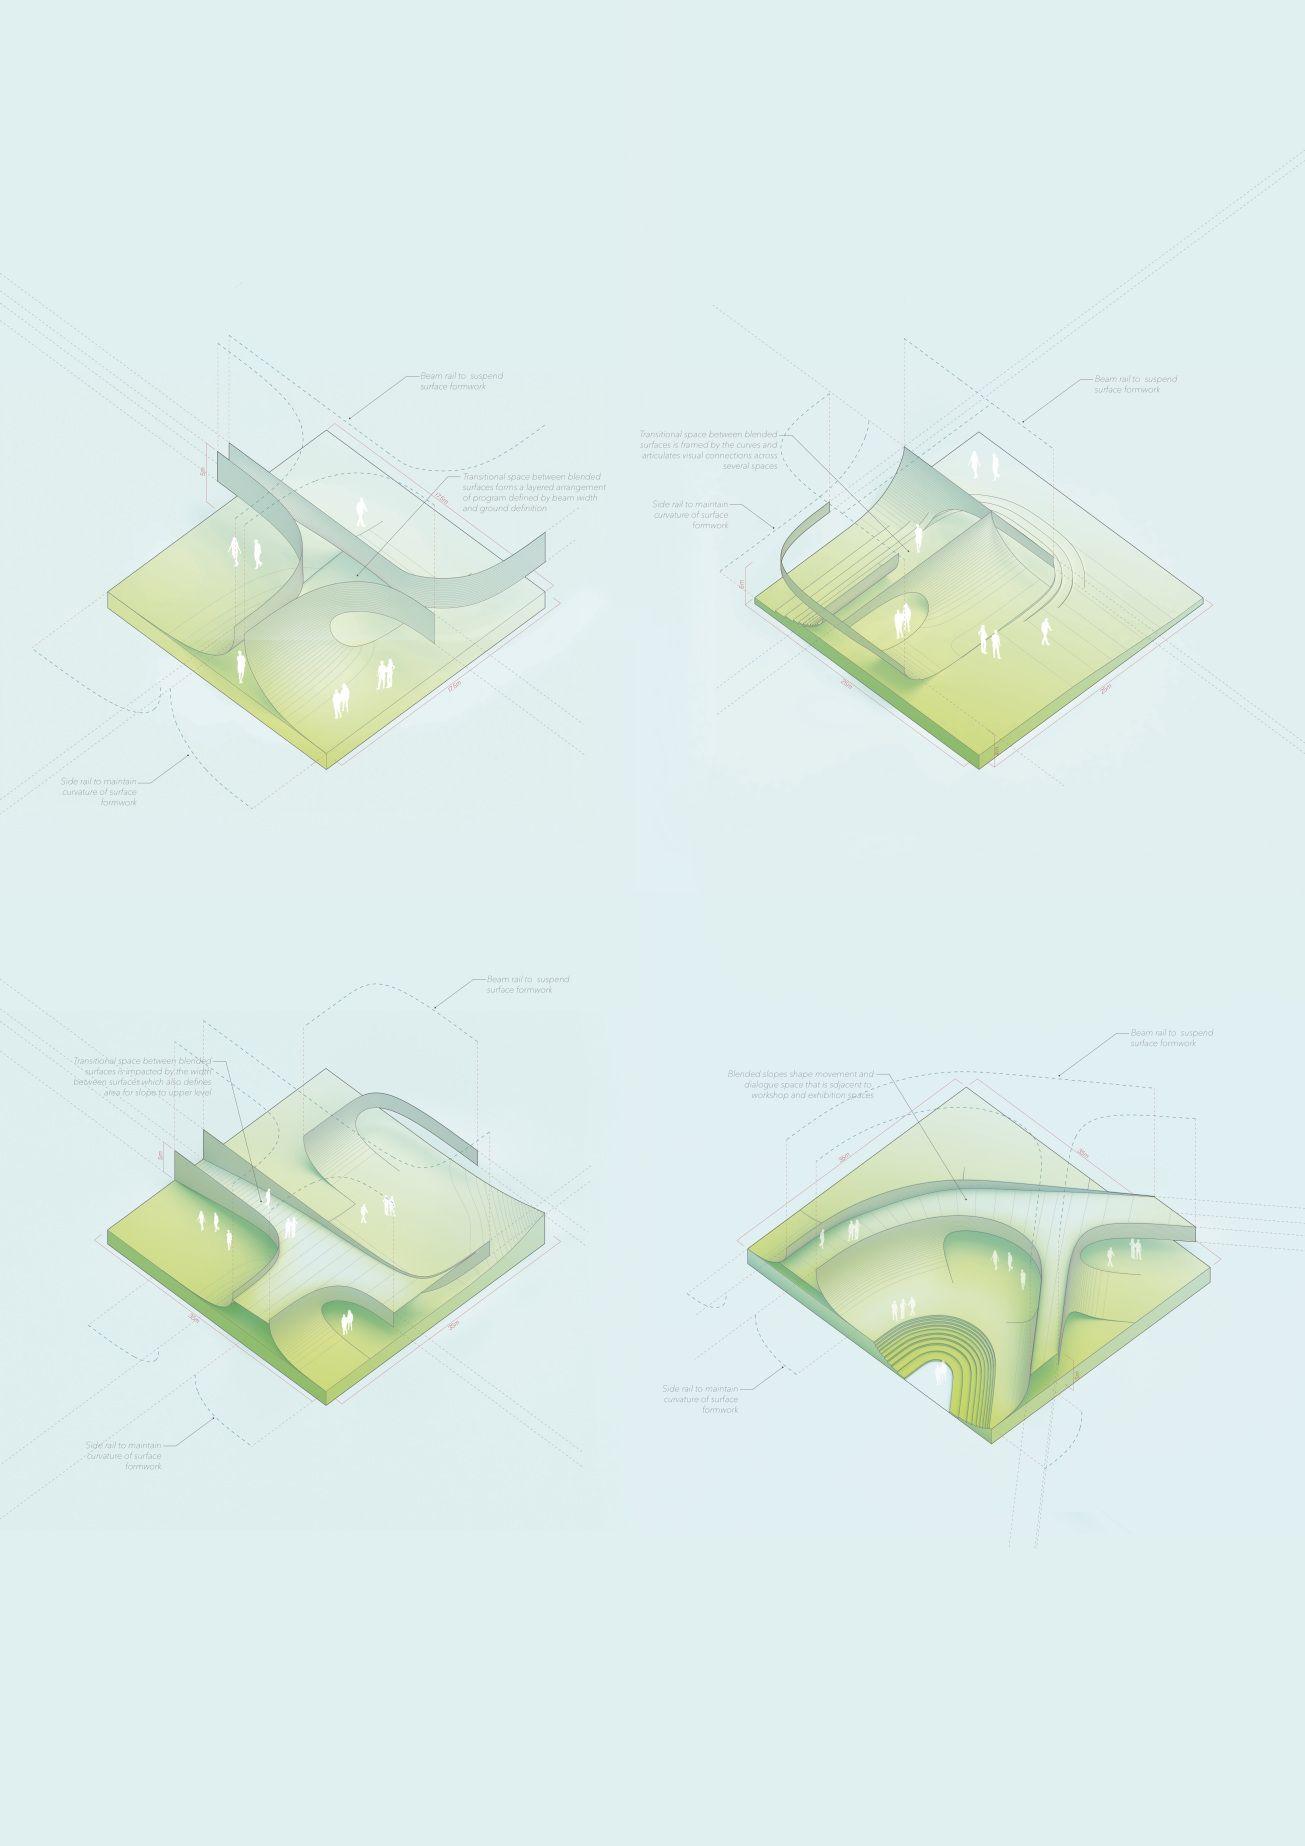 07 Tectonic Diagram Architecture Architecture Presentation Architecture Drawings